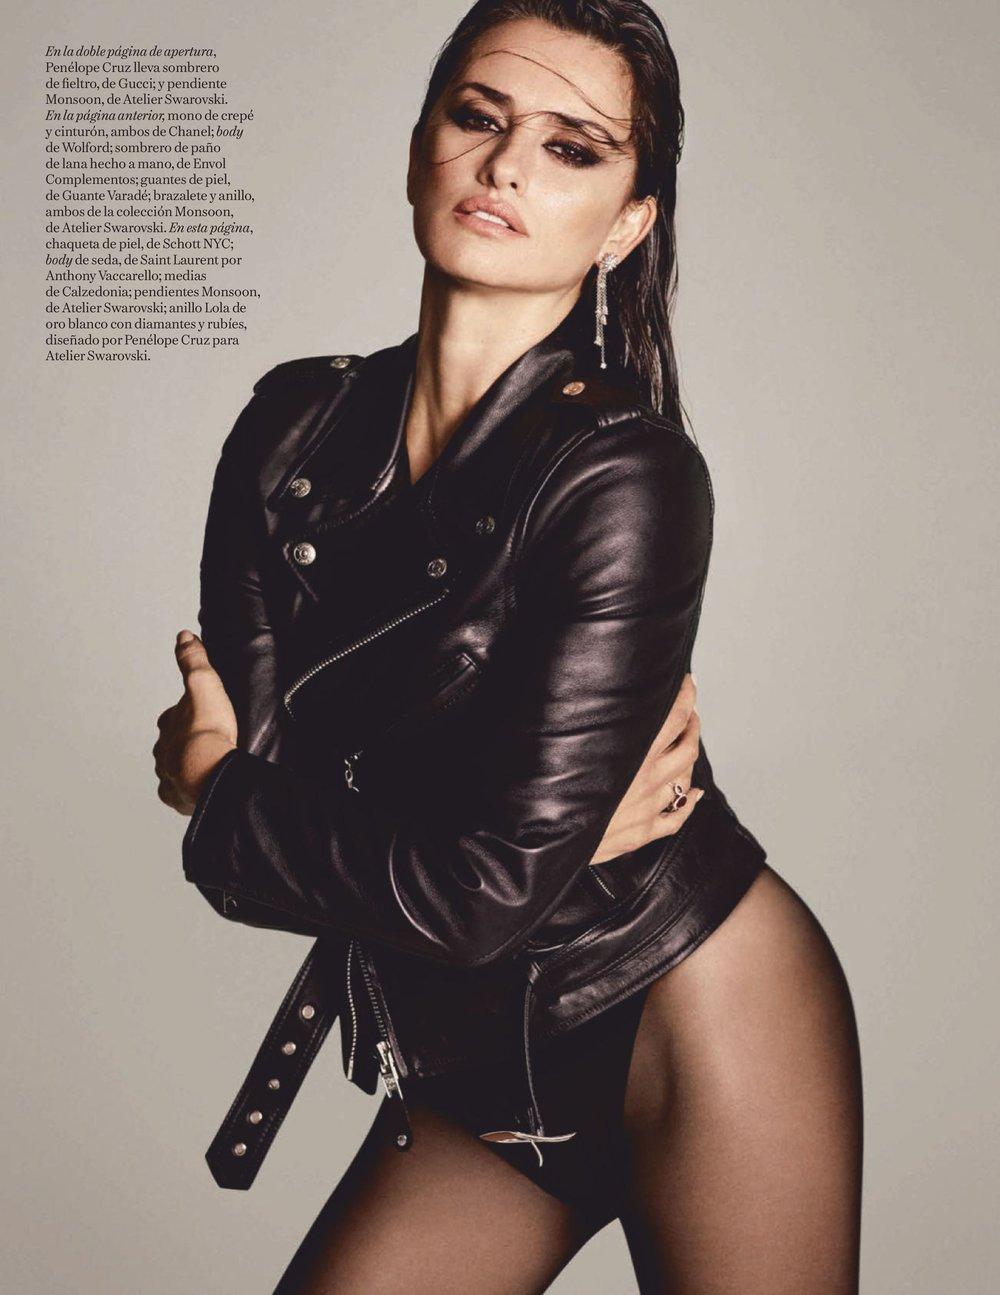 Penelope-Cruz-Luigi-Iango-Vogue-Spain-April-2019- (9).jpg